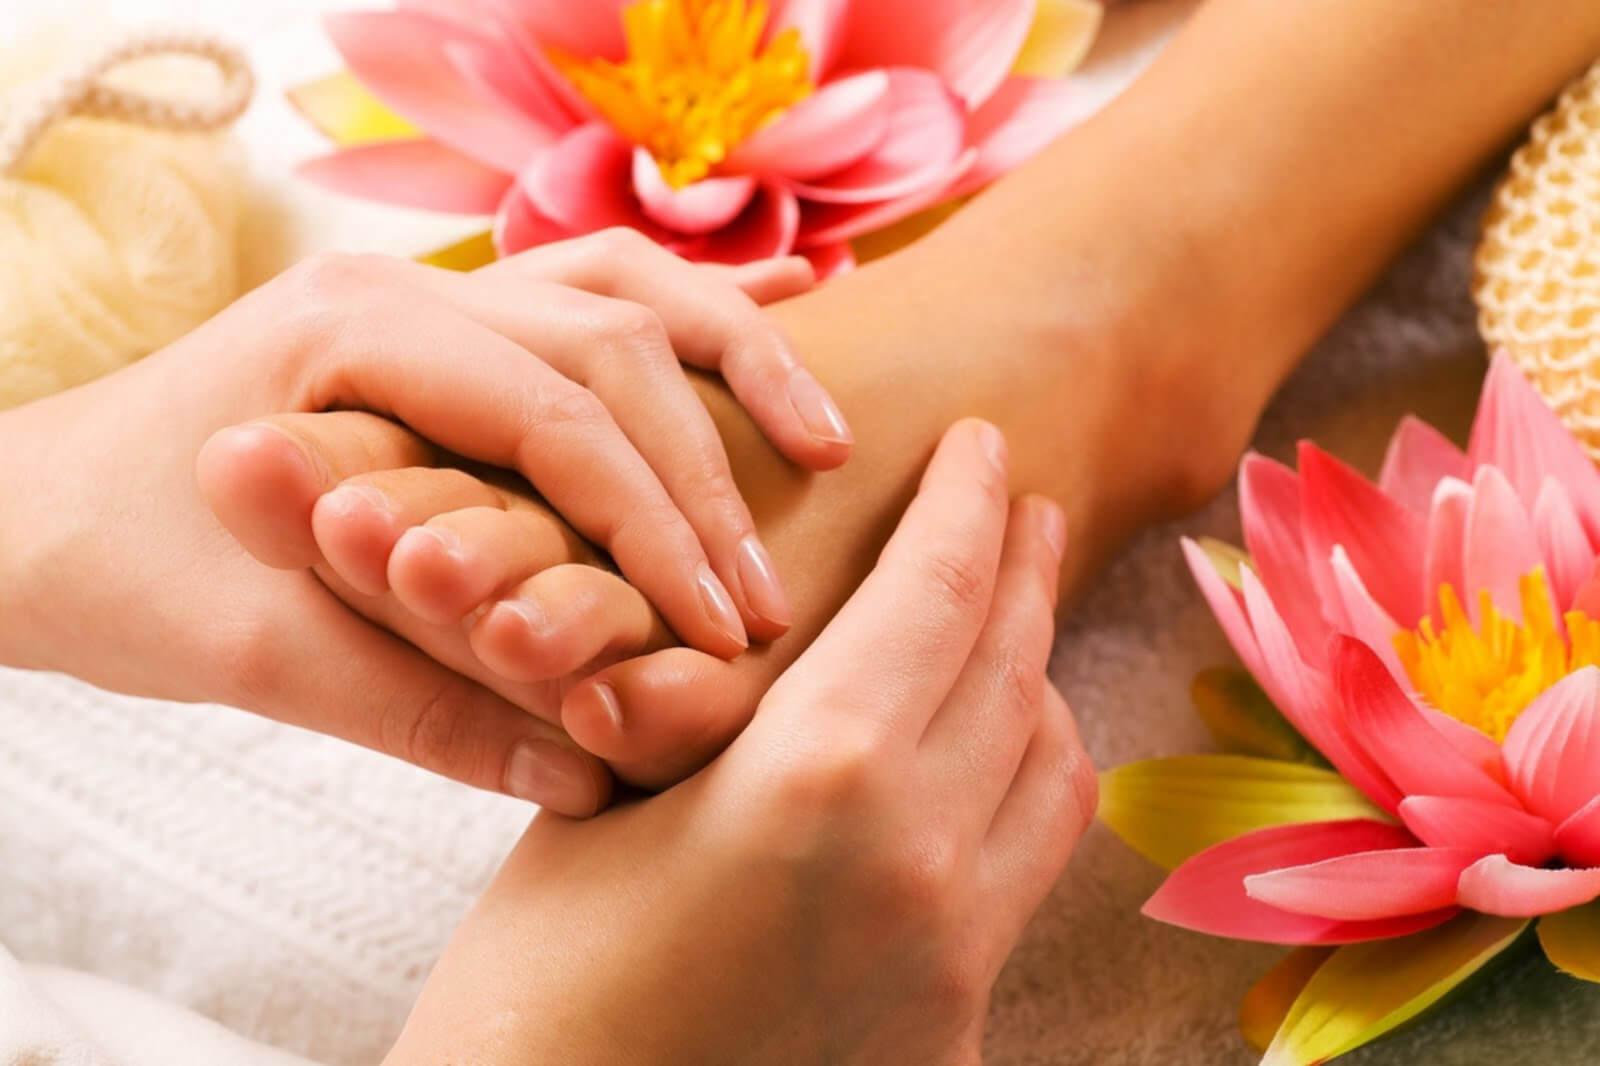 СПА процедура для рук и ног Скраб+крем+массаж